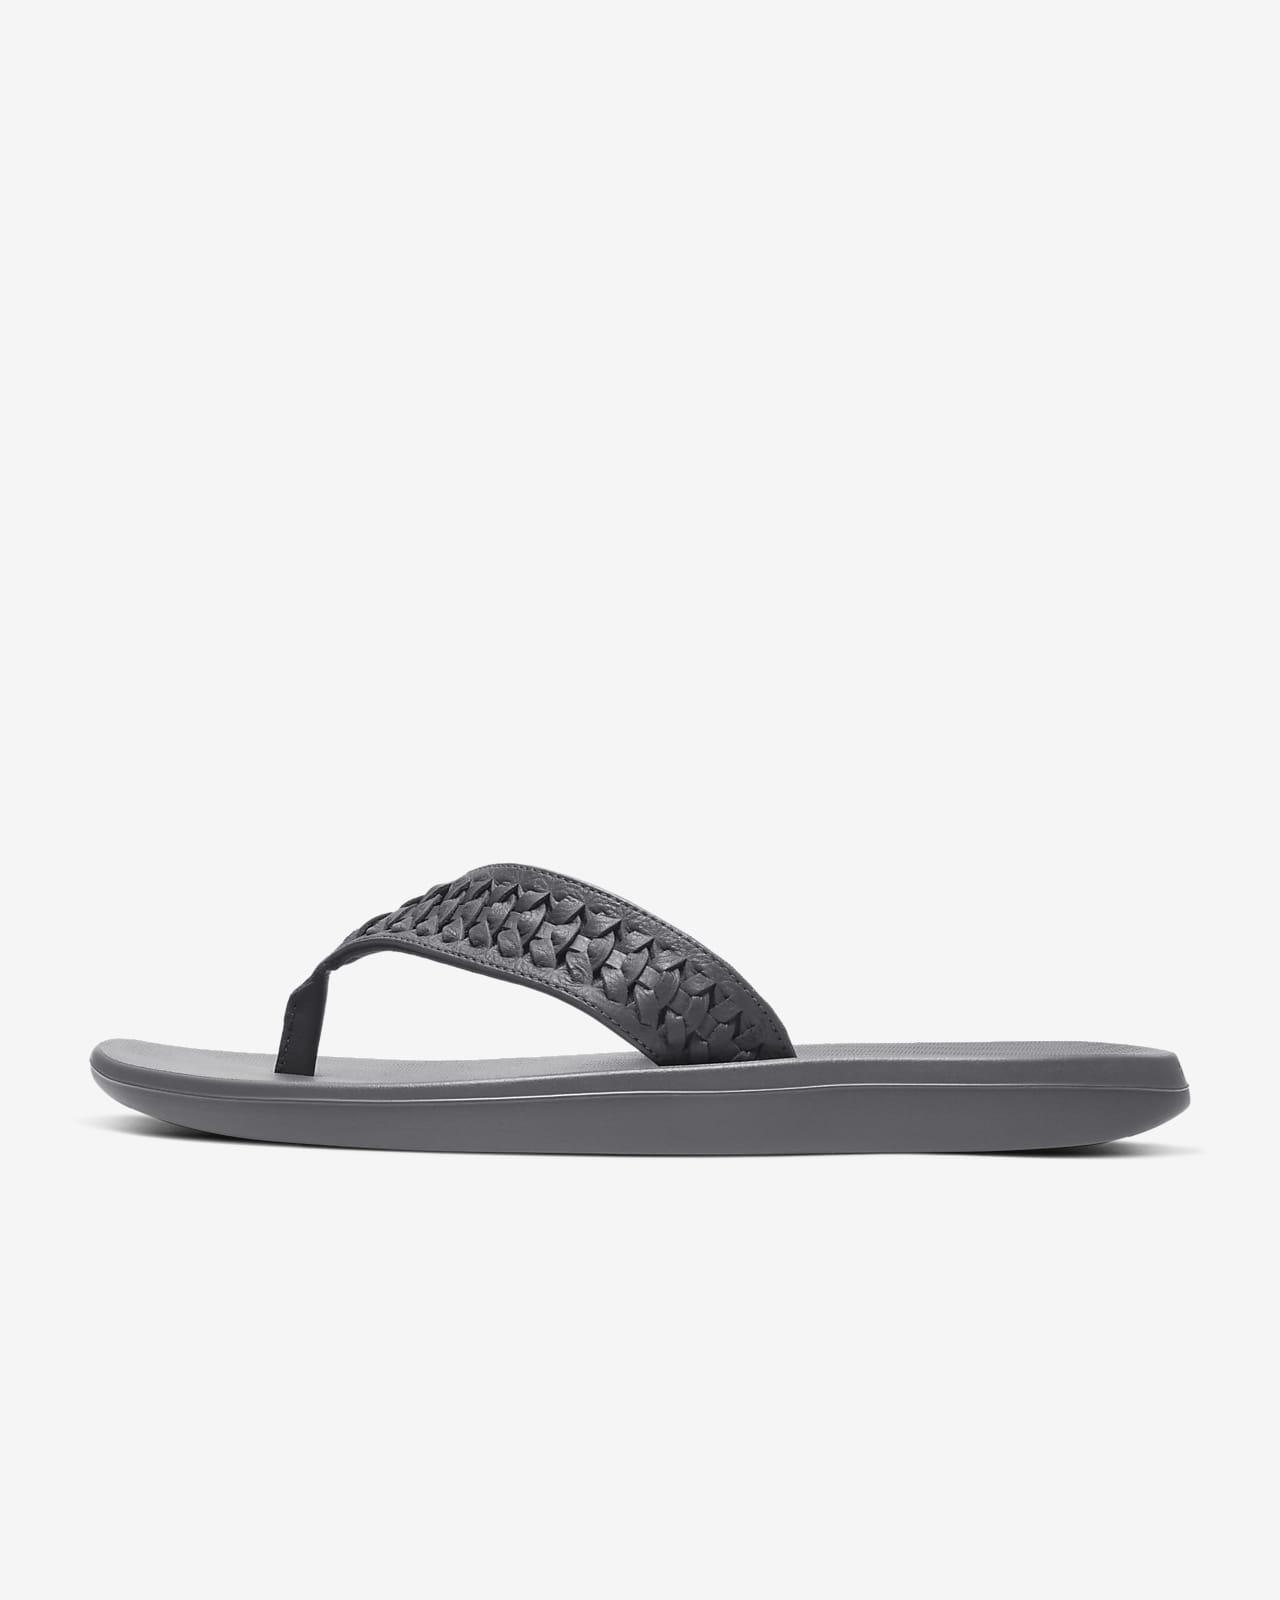 Nike Kepa Kai 2 Leather Men's Flip Flop